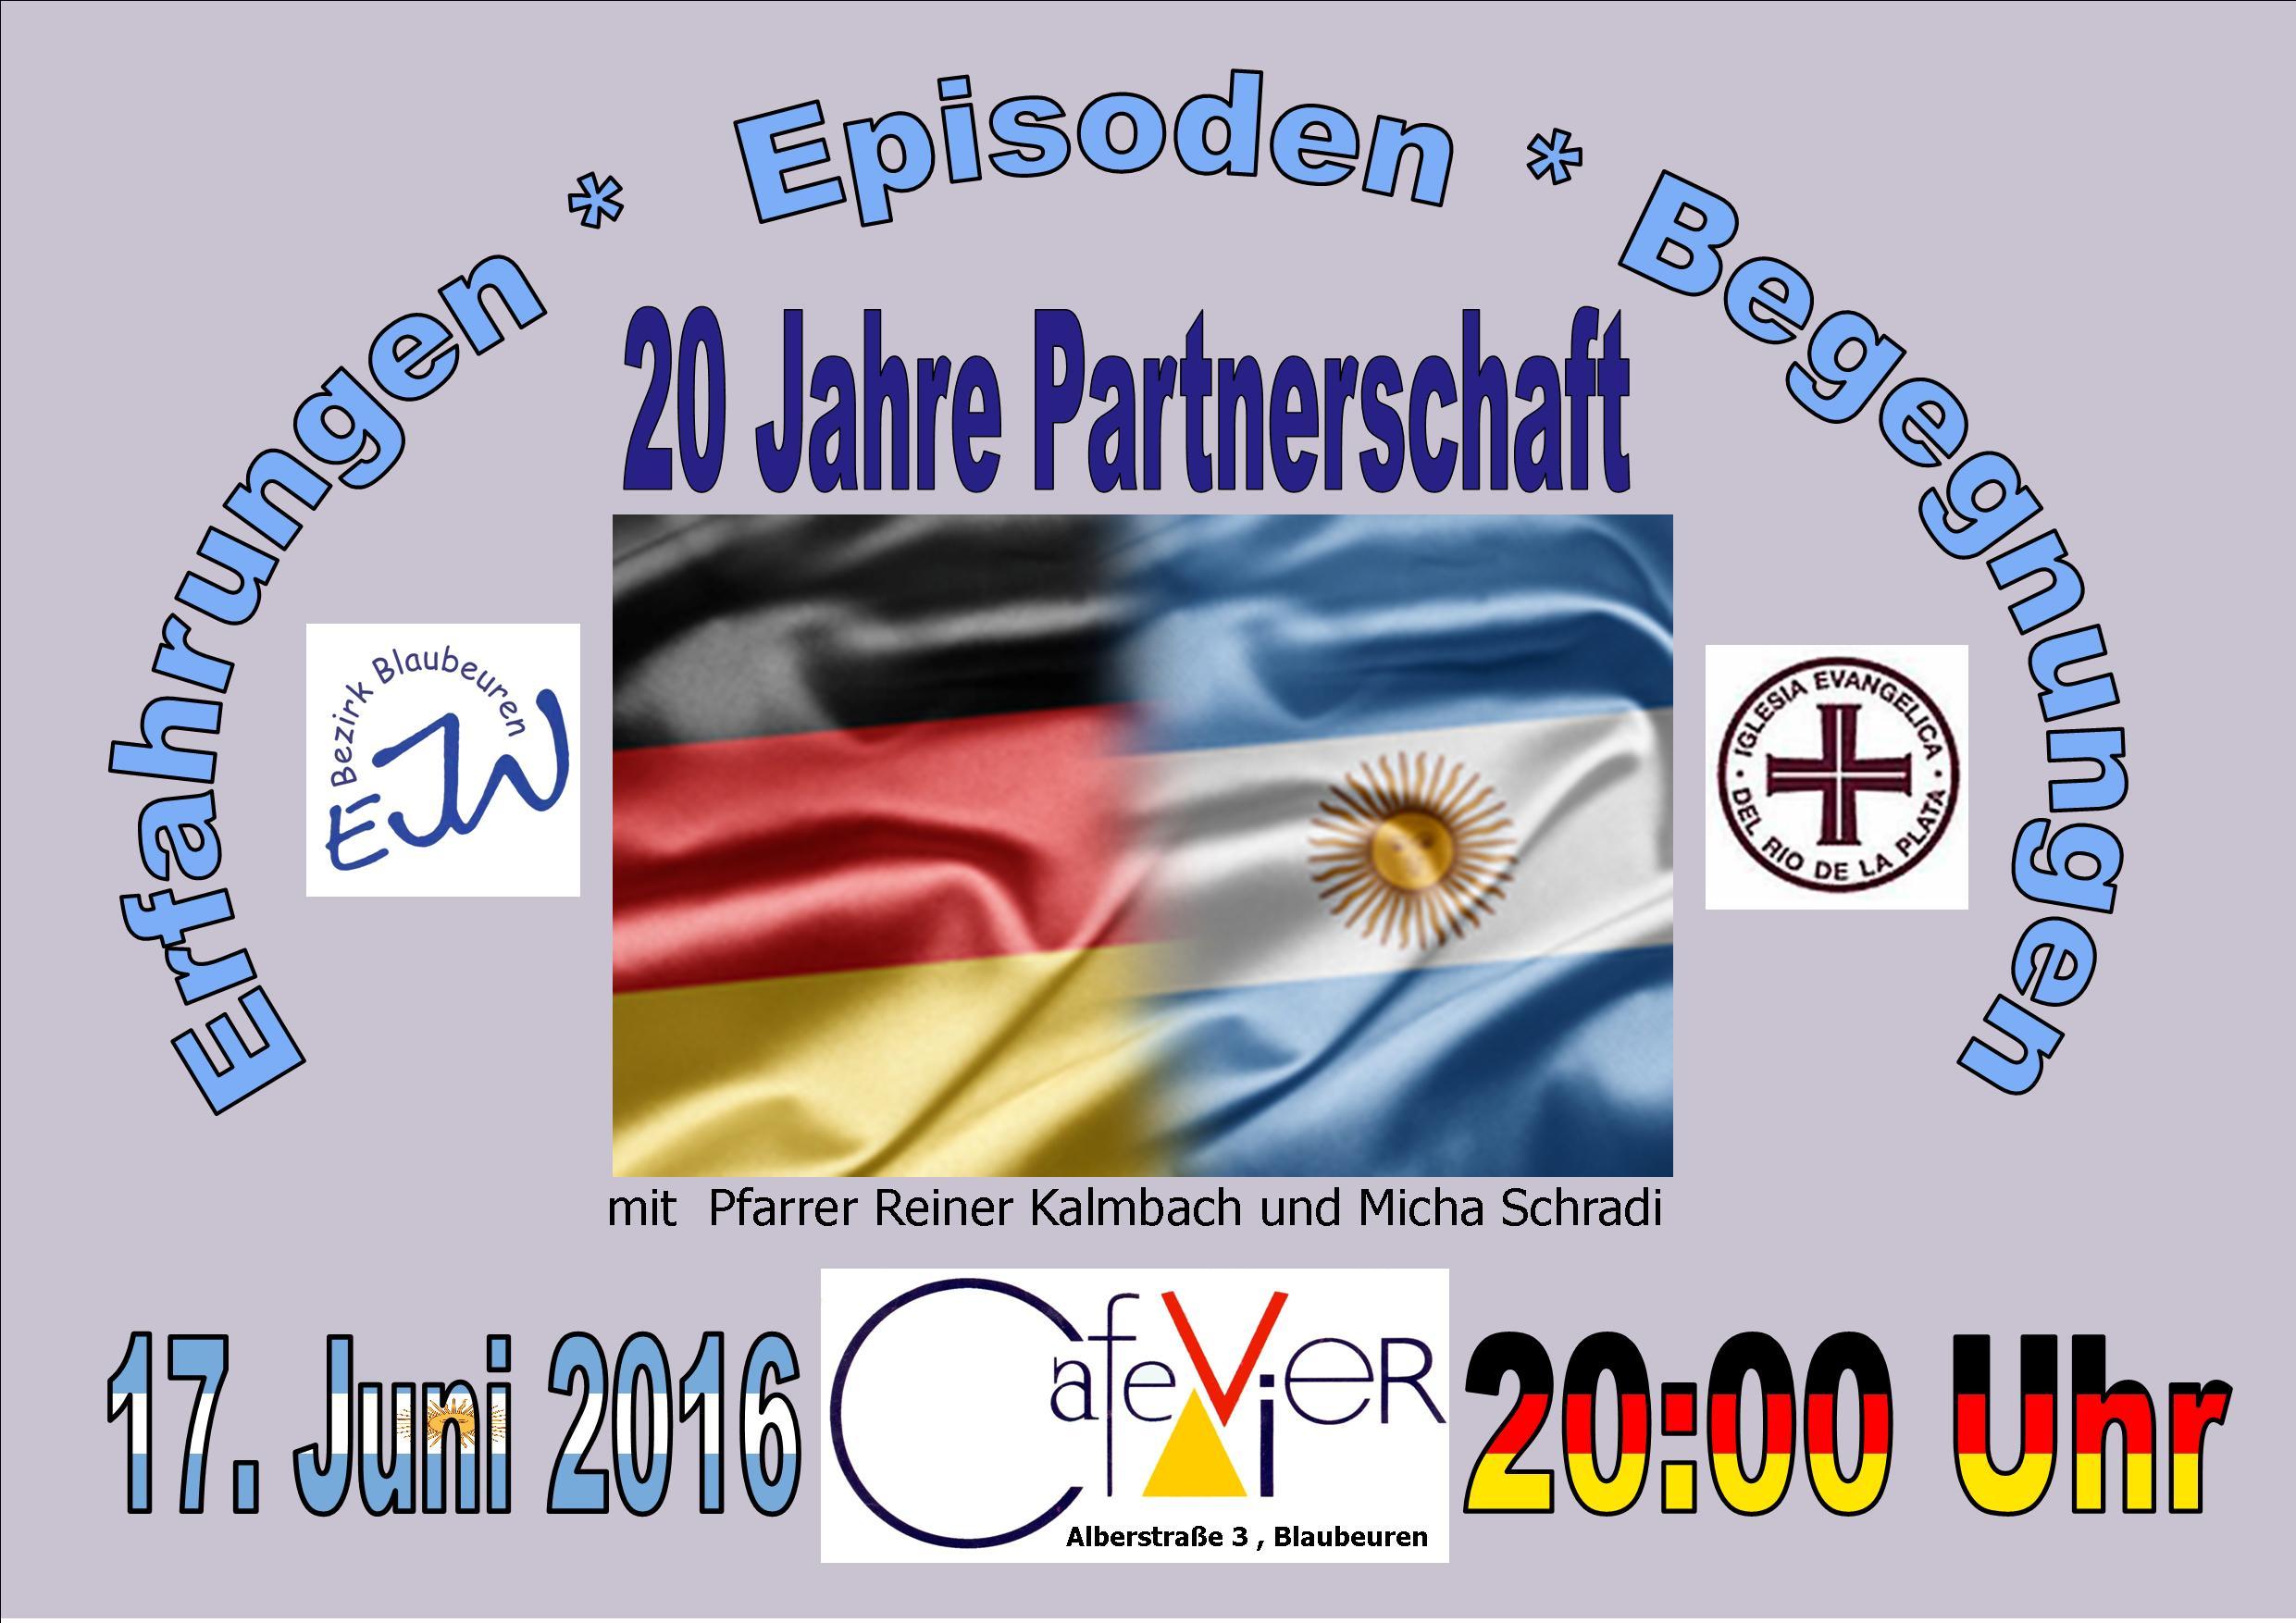 arg 20 jahre partnerschaft